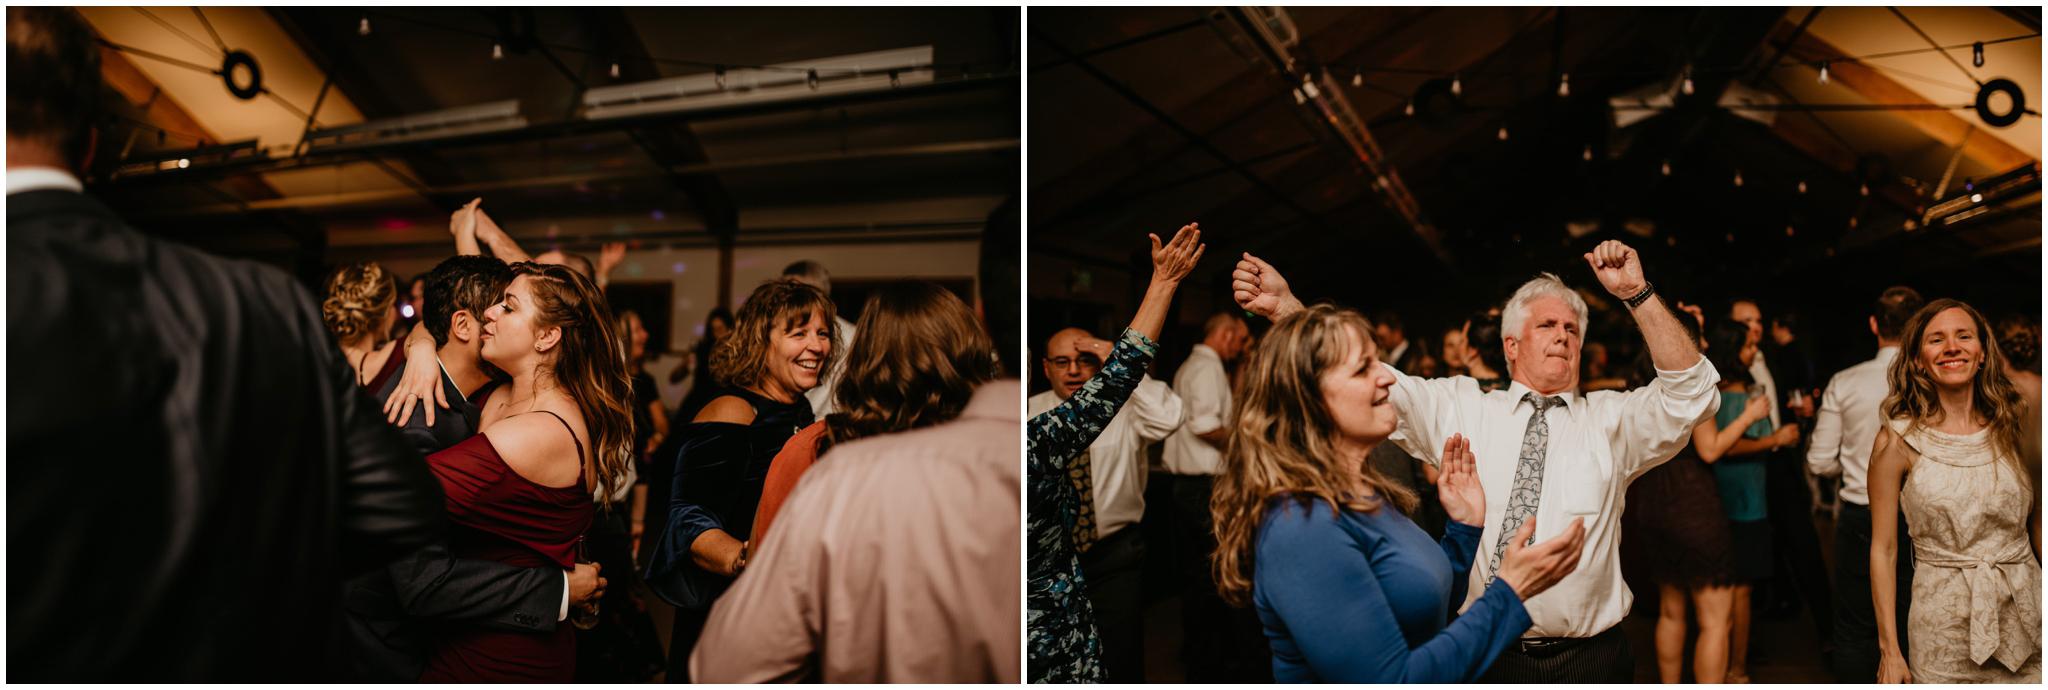 ashley-tj-the-pickering-barn-winter-wedding-seattle-photographer-091.jpg